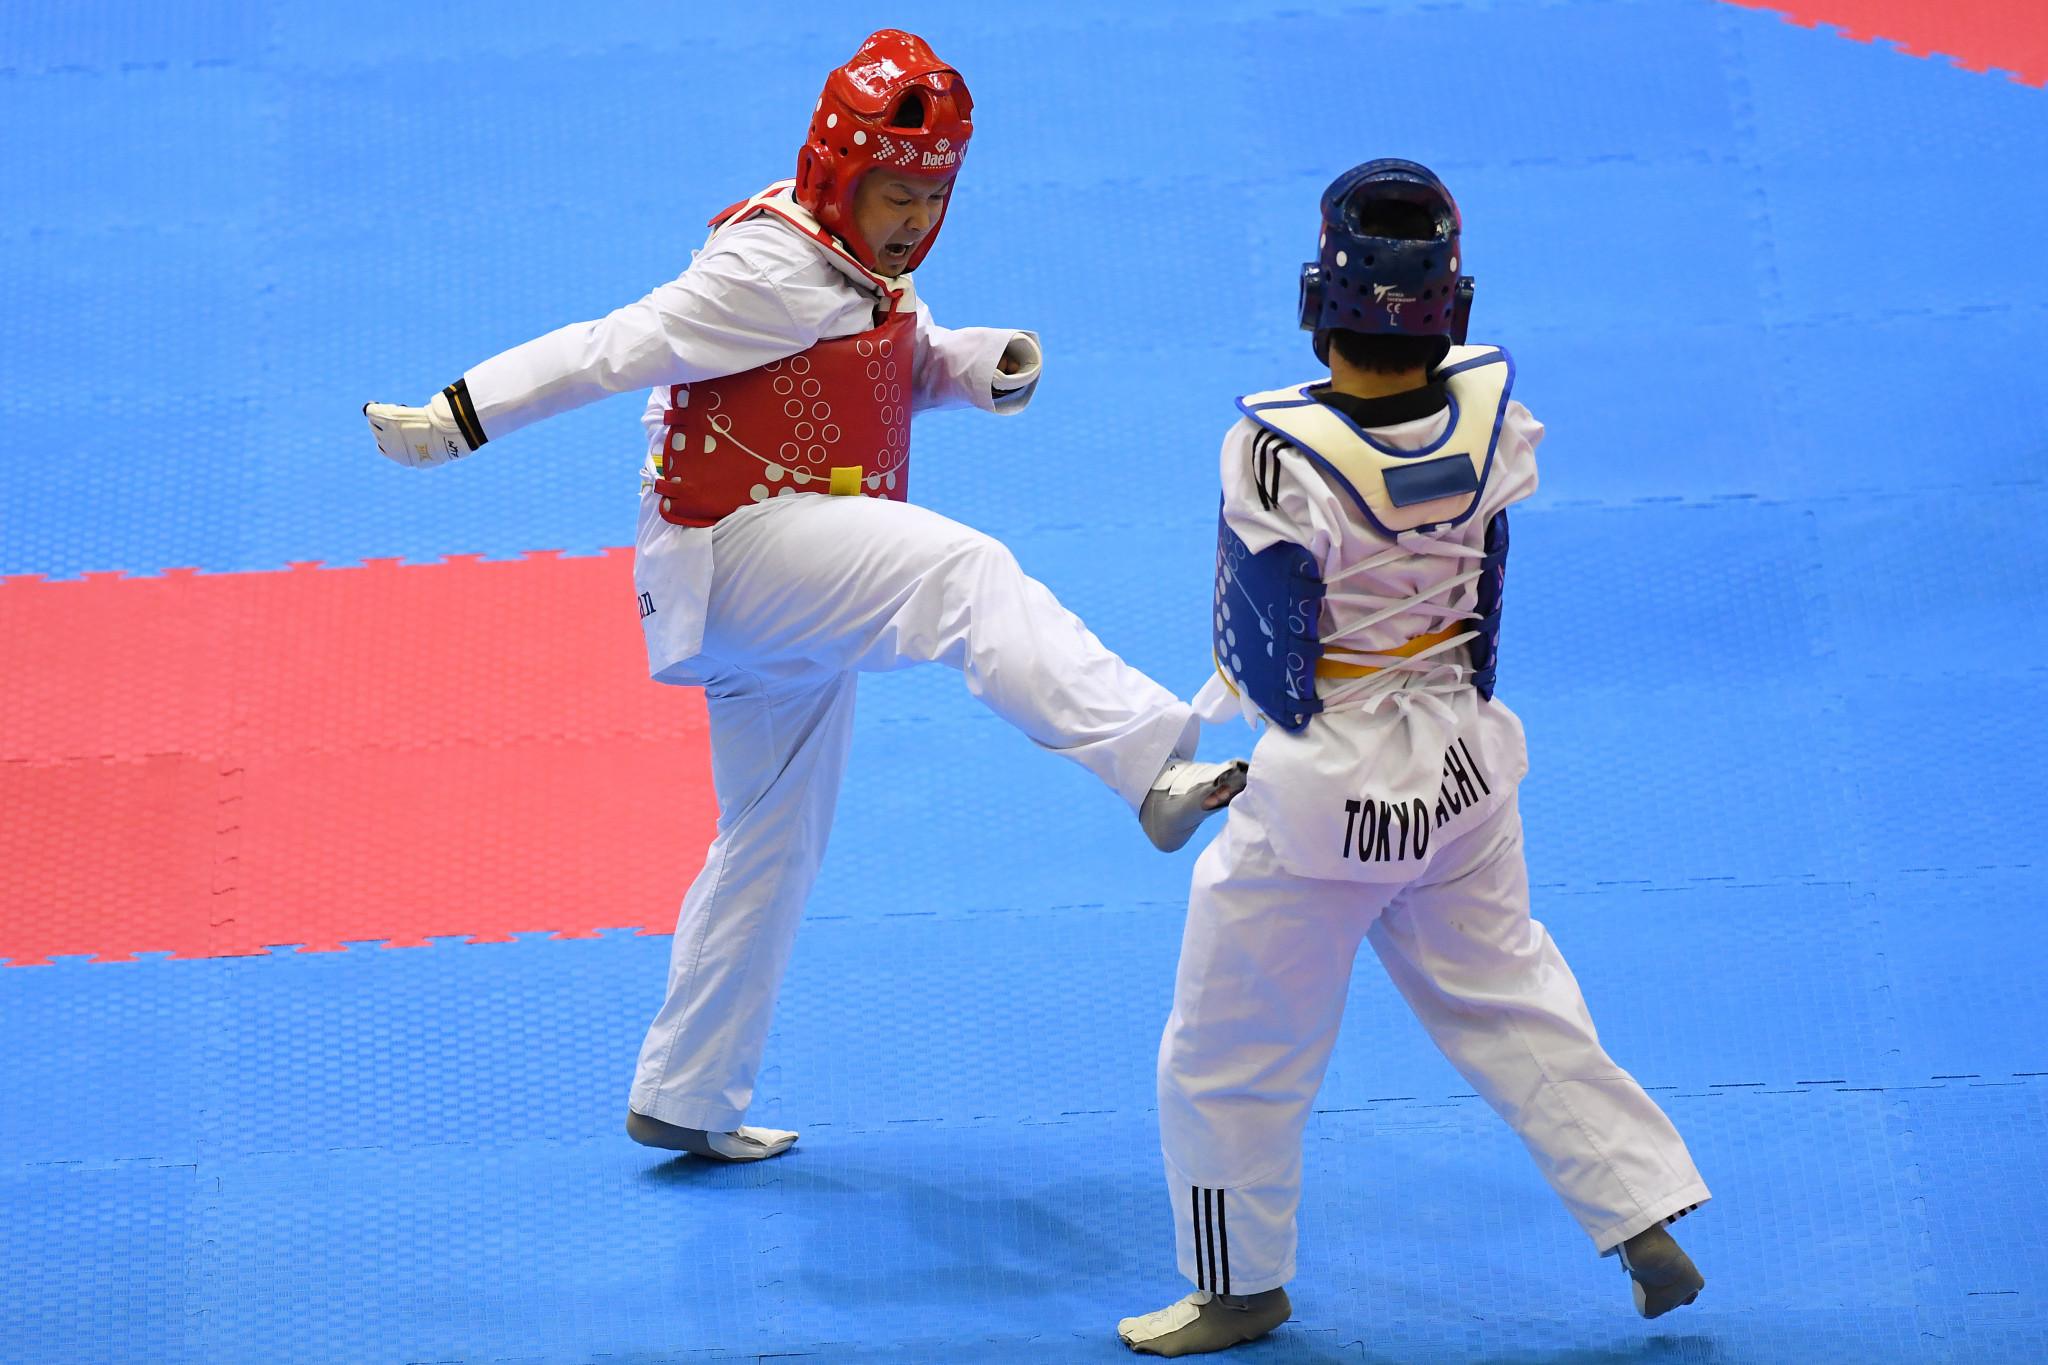 Para-taekwondo is due to make its Paralympic debut at Tokyo 2020 ©Getty Images